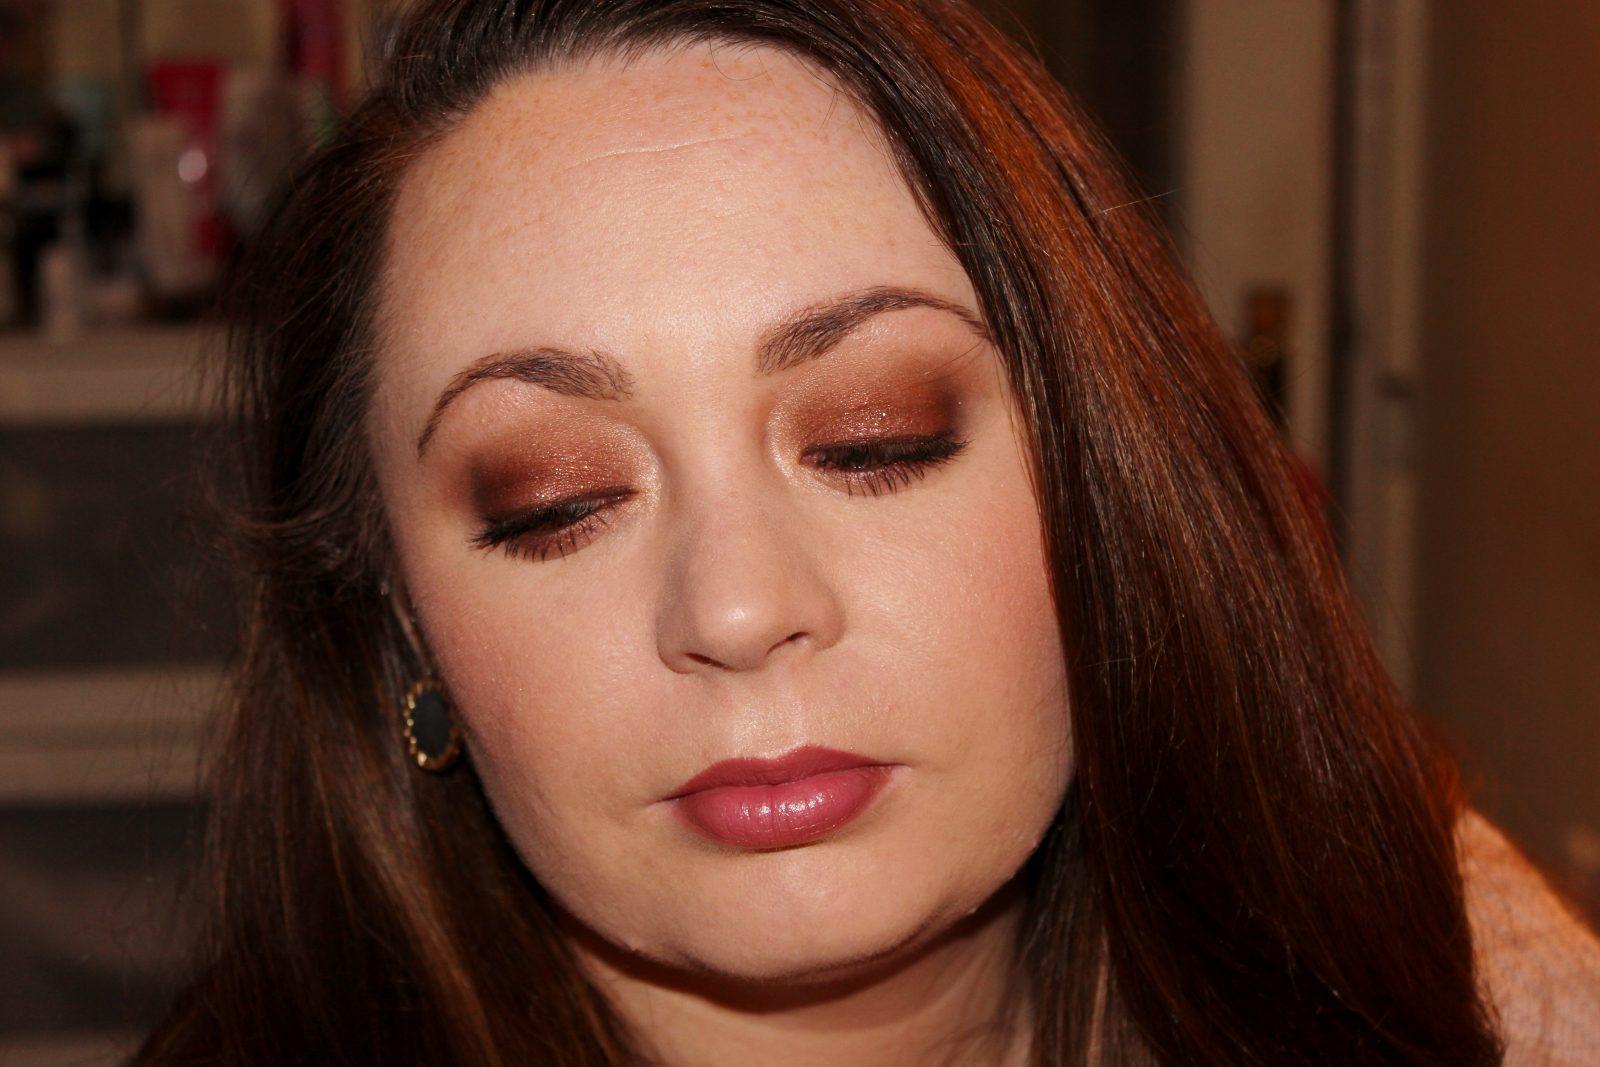 Charlotte Tilbury Dolce Vita Palette (23)